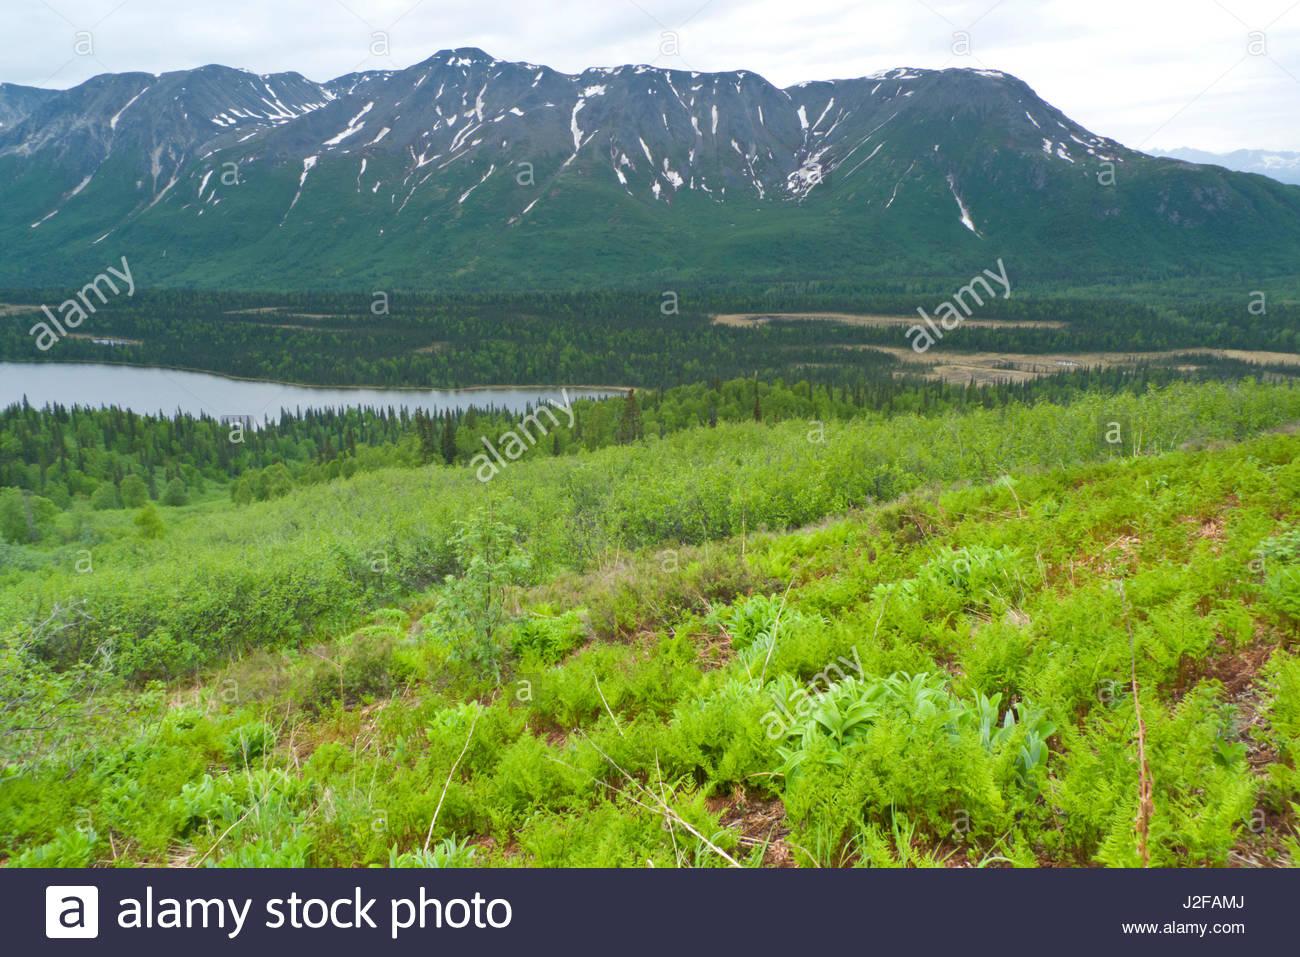 Alaska matanuska susitna county talkeetna - Stock Photo View From Hill East Of Miami Lake In The Talkeetna Mountains Matanuska Susitna Borough Alaska Usa